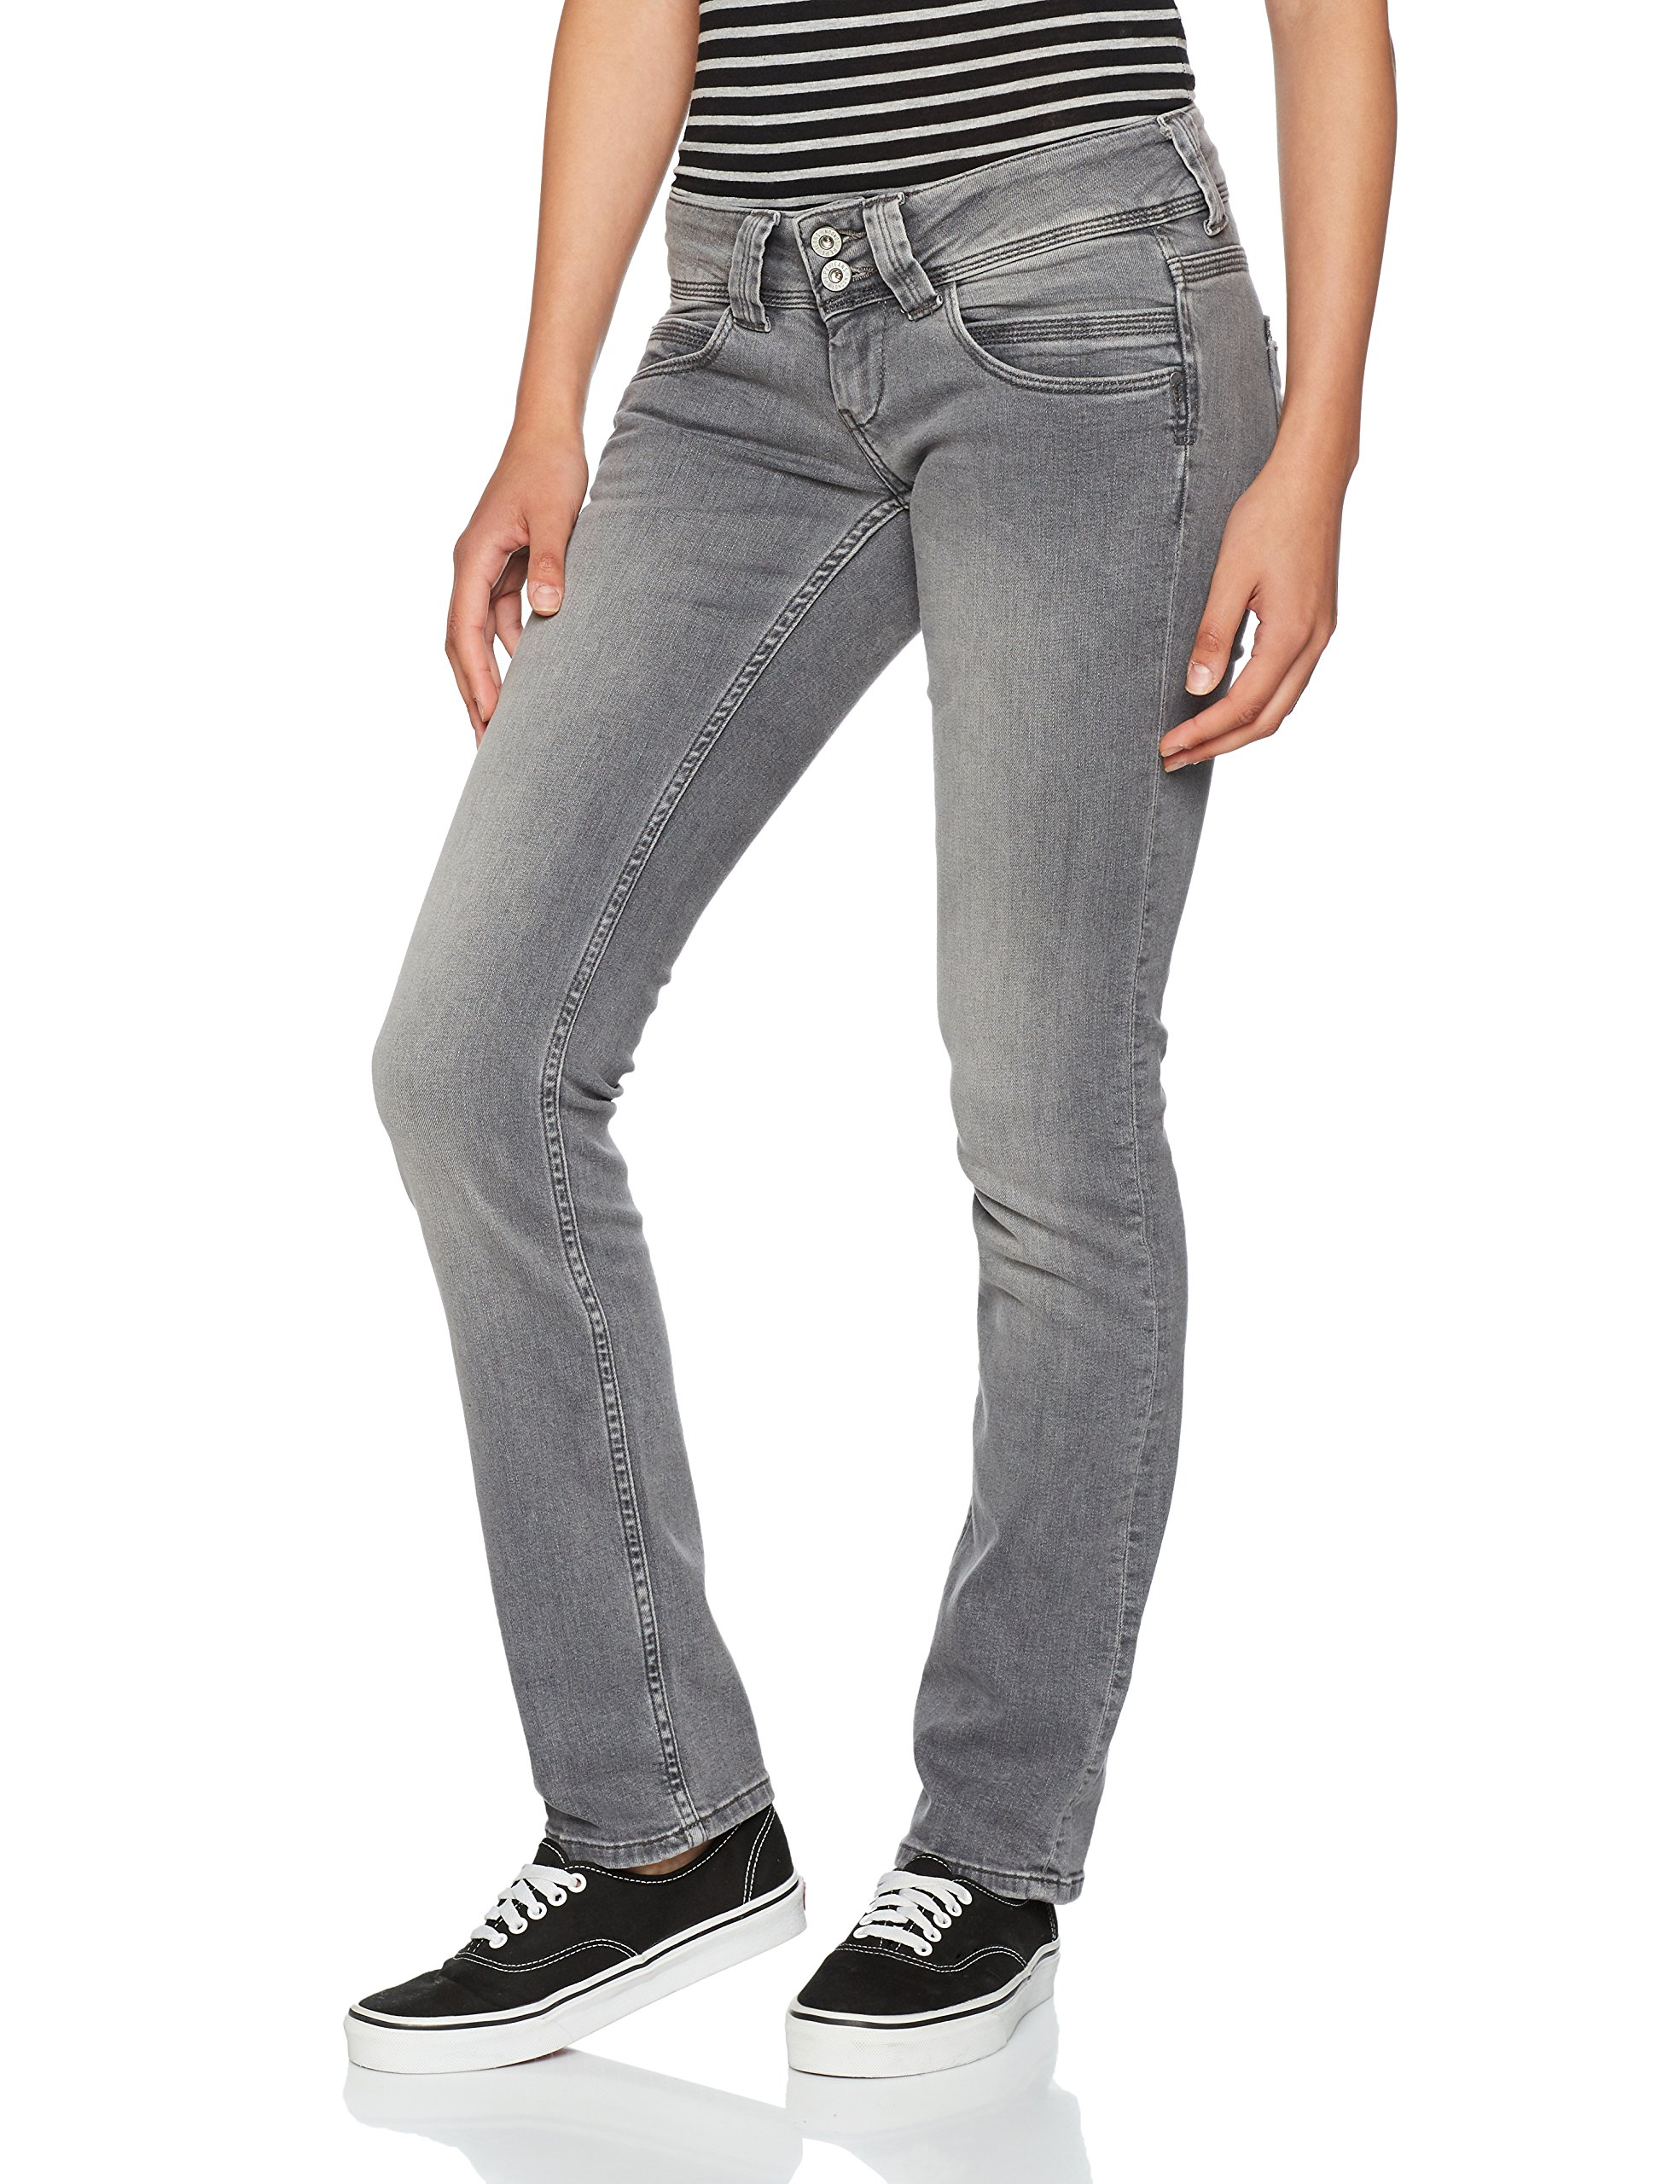 Femme Jean GrisdenimW44 Venus Droit Fabricant l32taille Jeans Pepe 33 PiXZuk